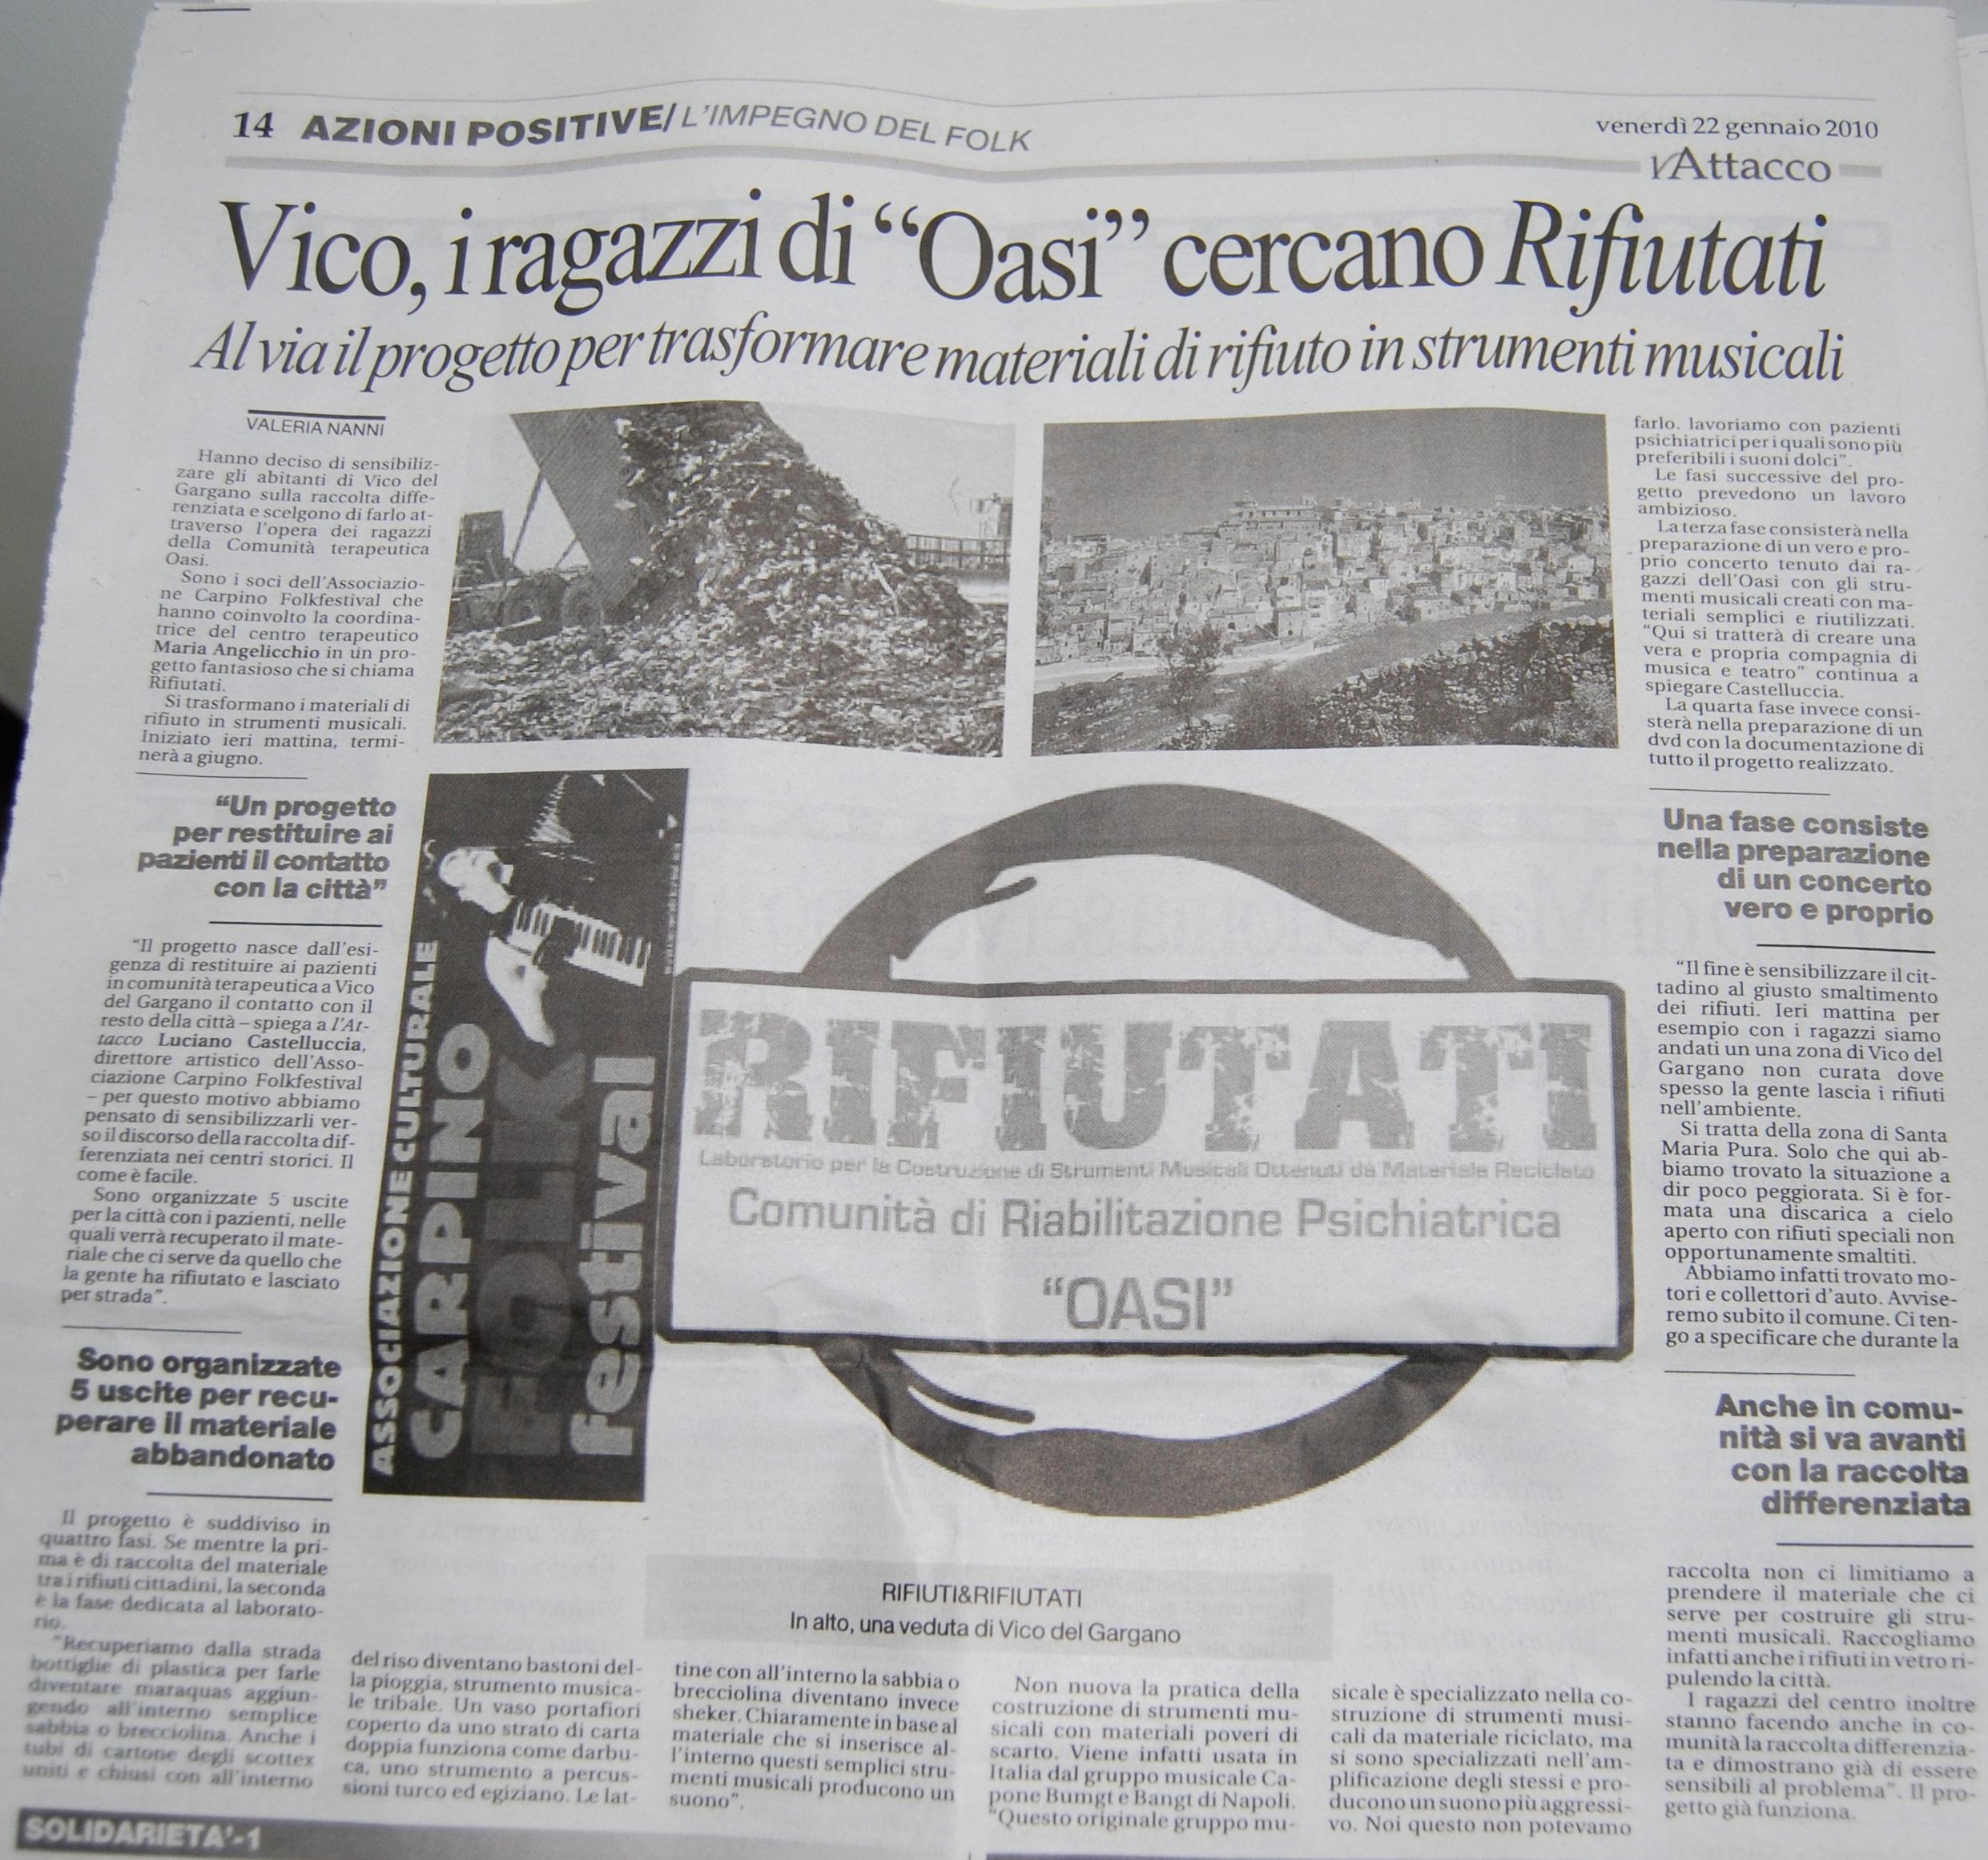 Vico del gargano antonio basile official blog - Progetto casa fossato di vico ...